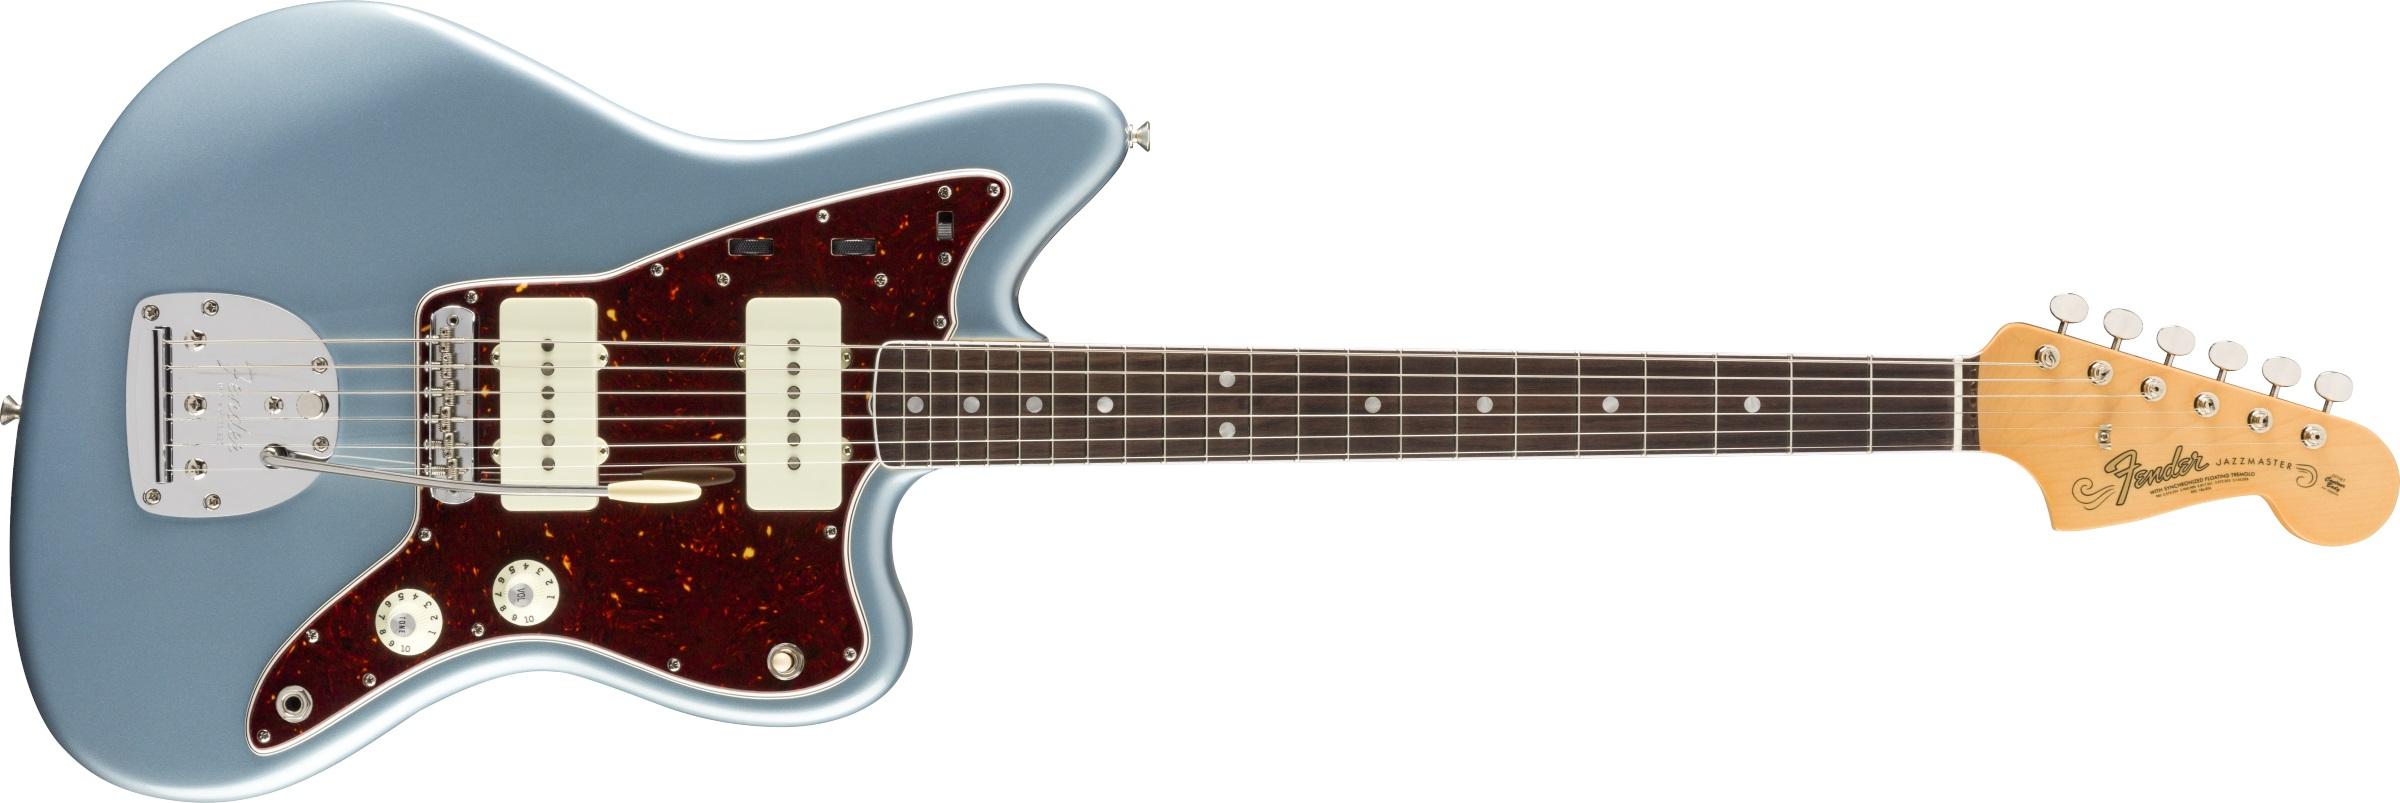 Fender American Original 60s Jazzmaster RW IBM